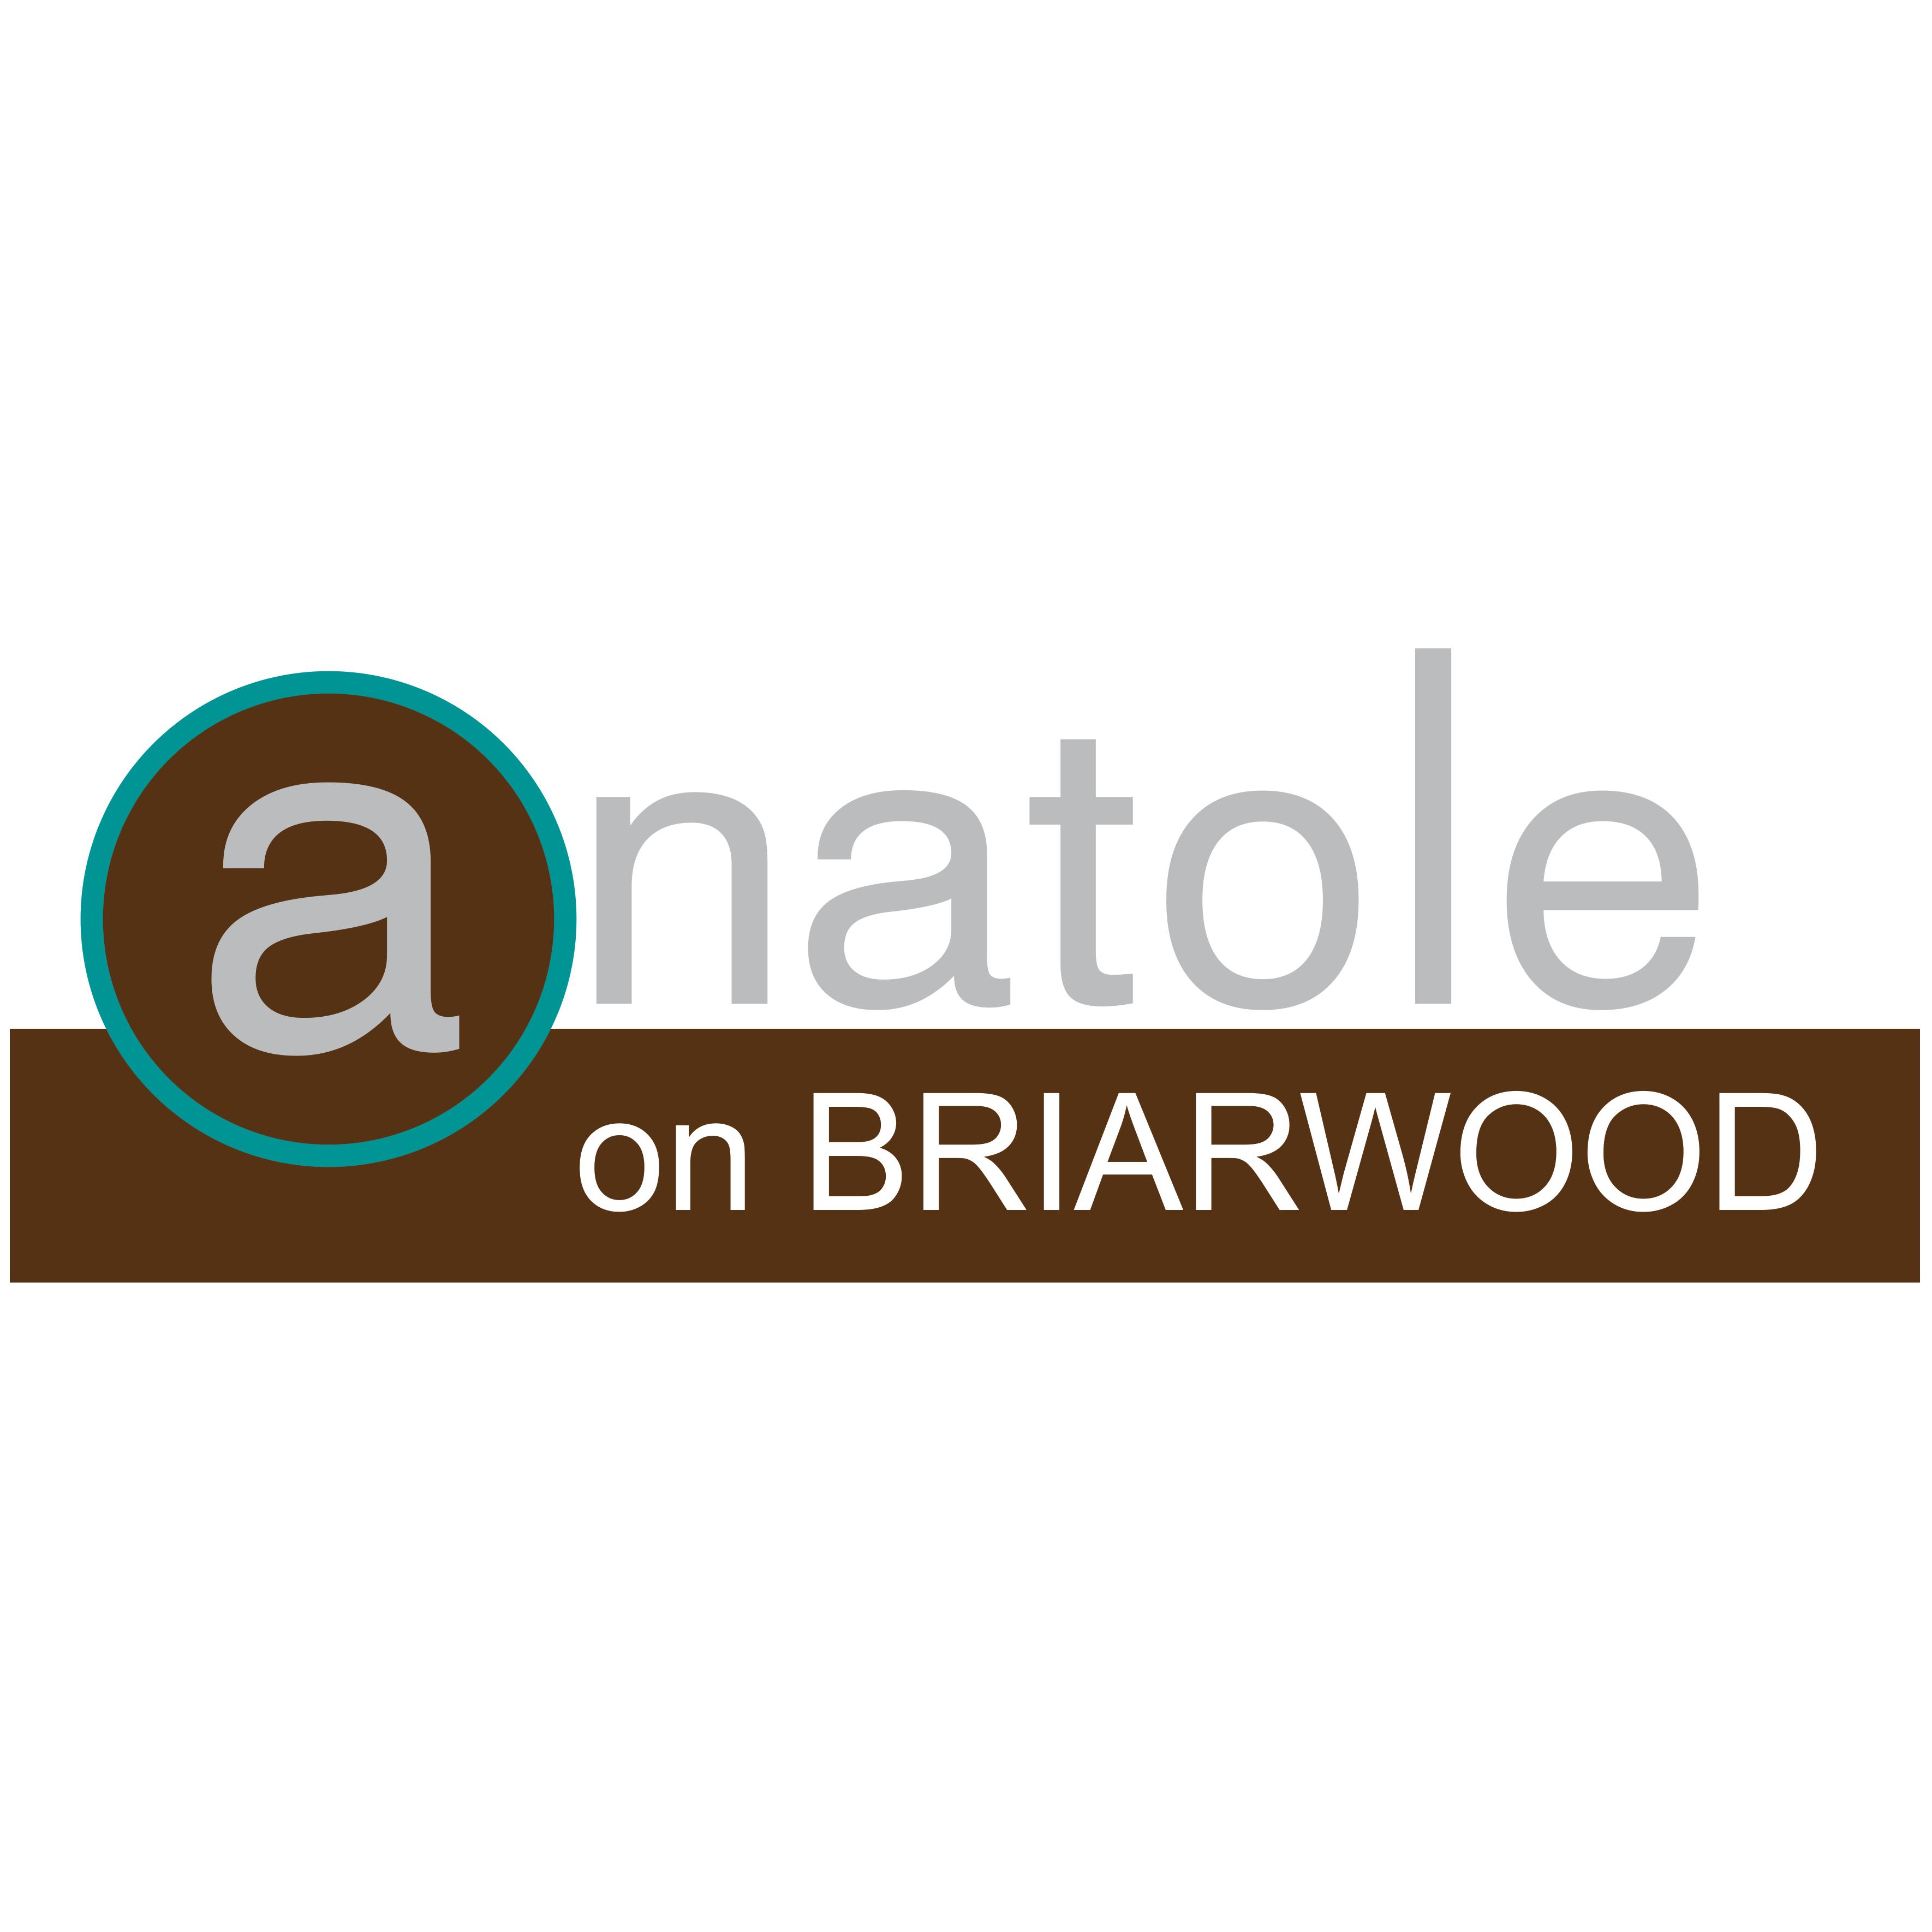 Anatole on Briarwood